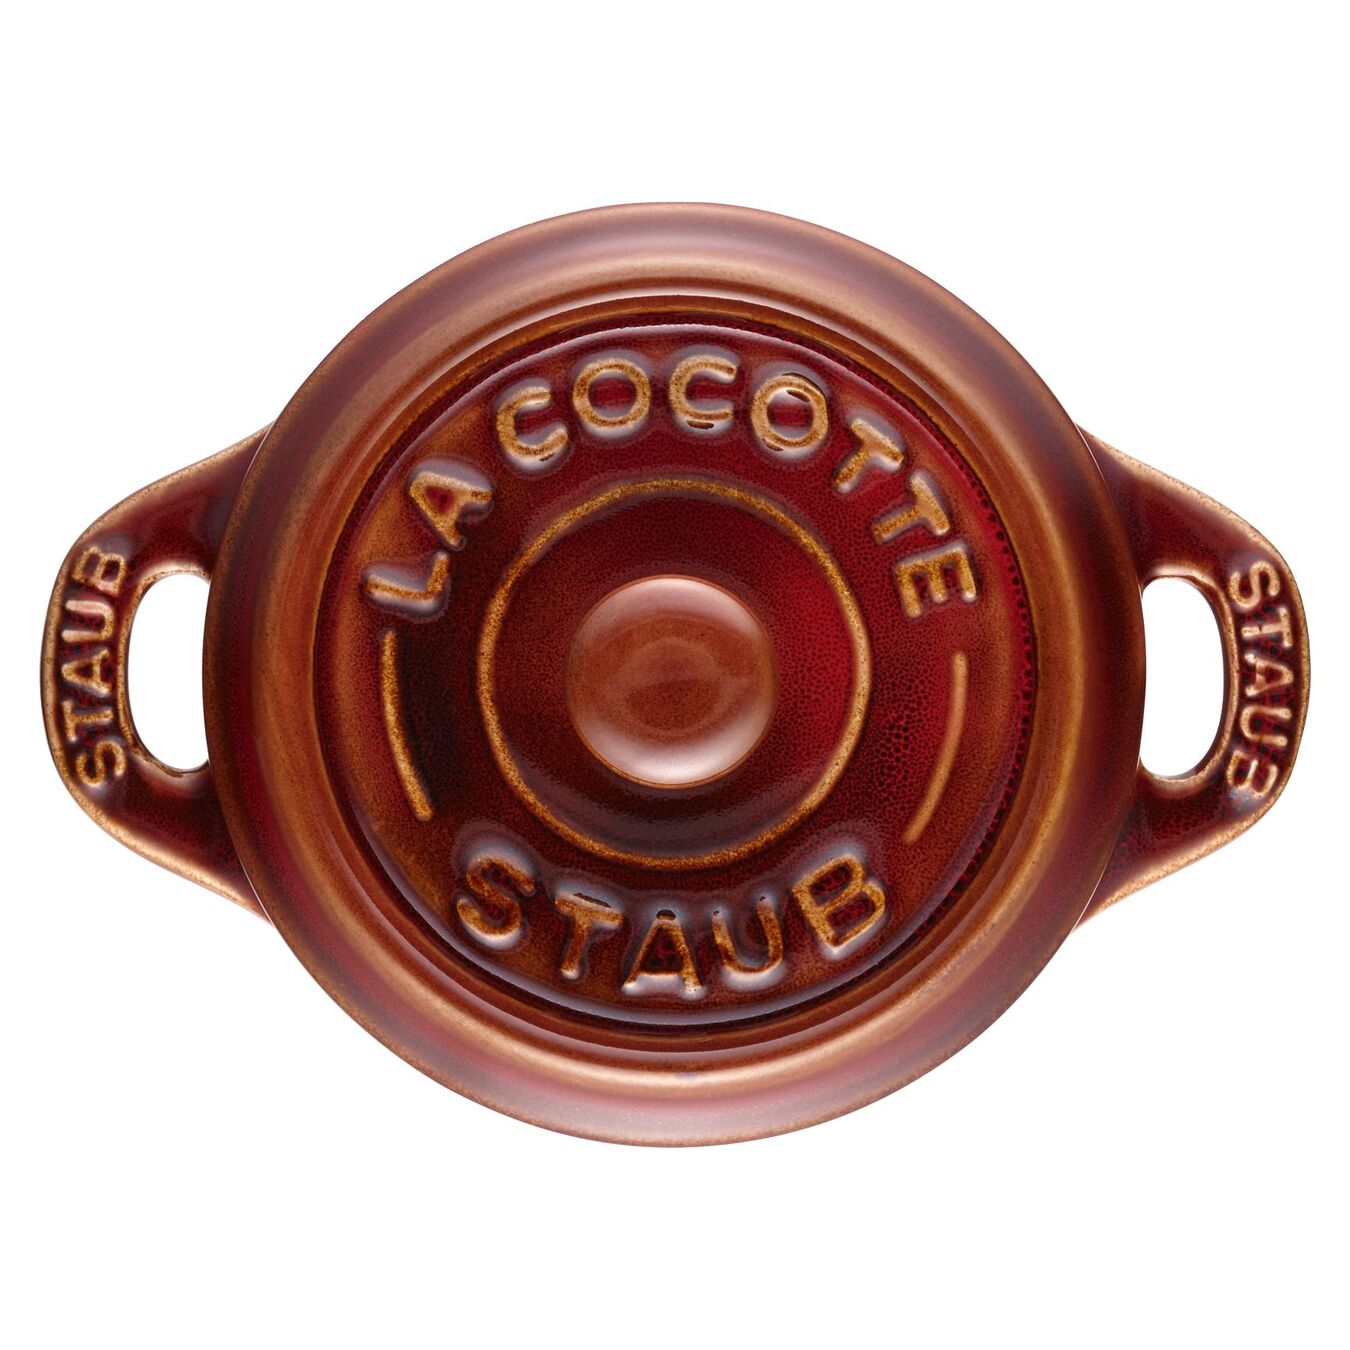 Minigryta 10 cm, Rund, Antik koppar, Ceramic,,large 5